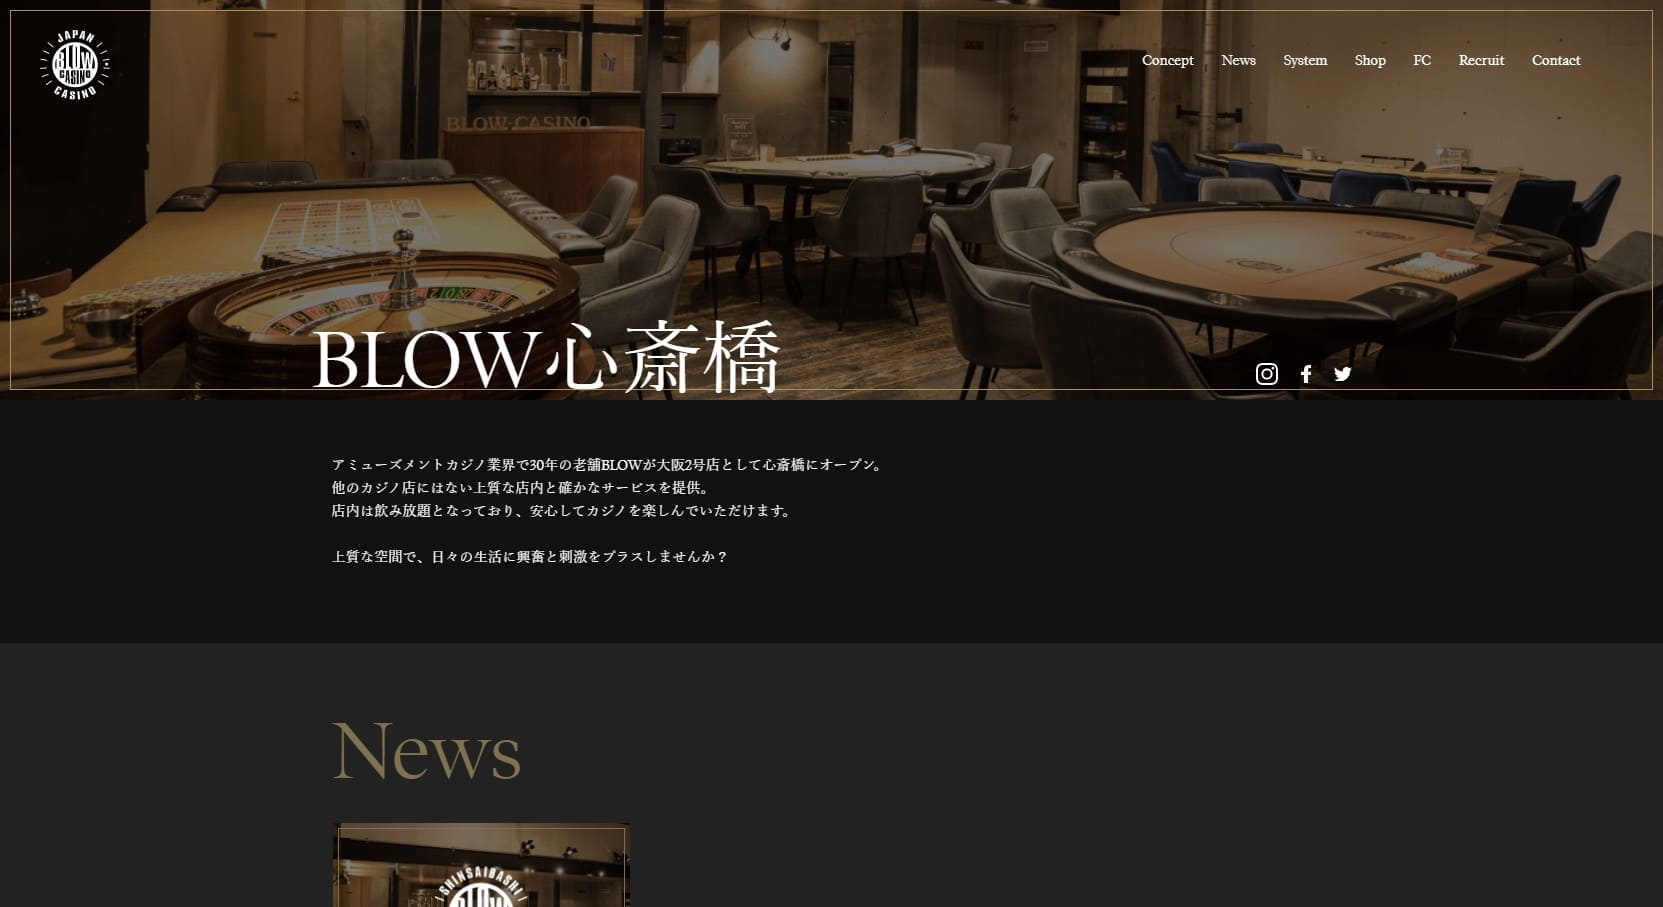 BLOW CASINO心斎橋のウェブサイト画像。